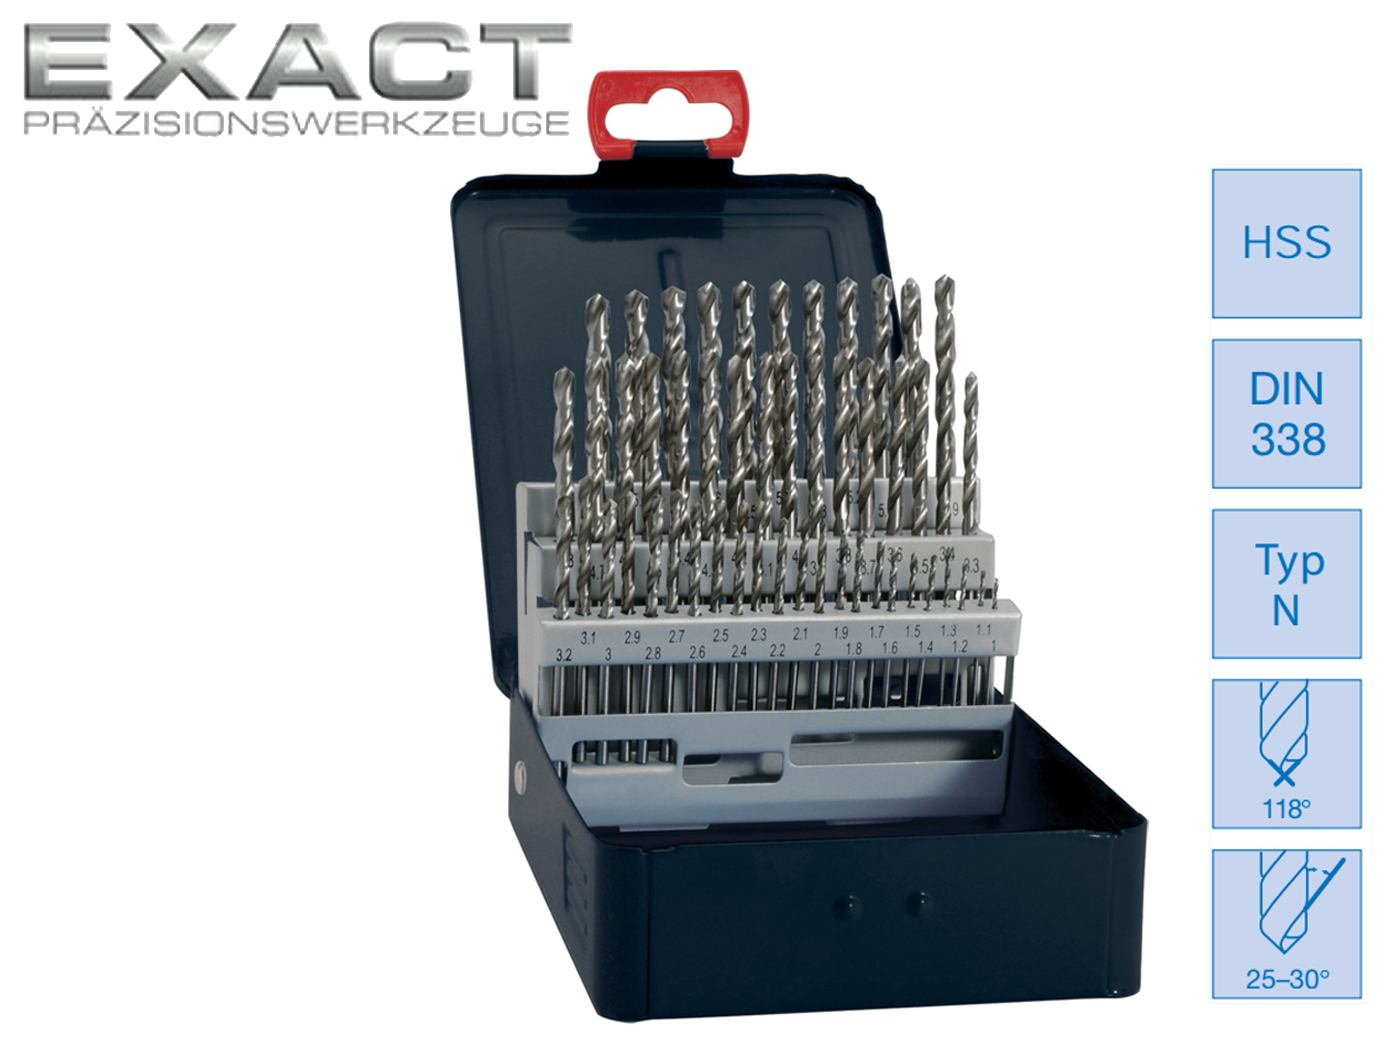 Spiraalboor set DIN 338 N HSS geslepen blank | DKMTools - DKM Tools